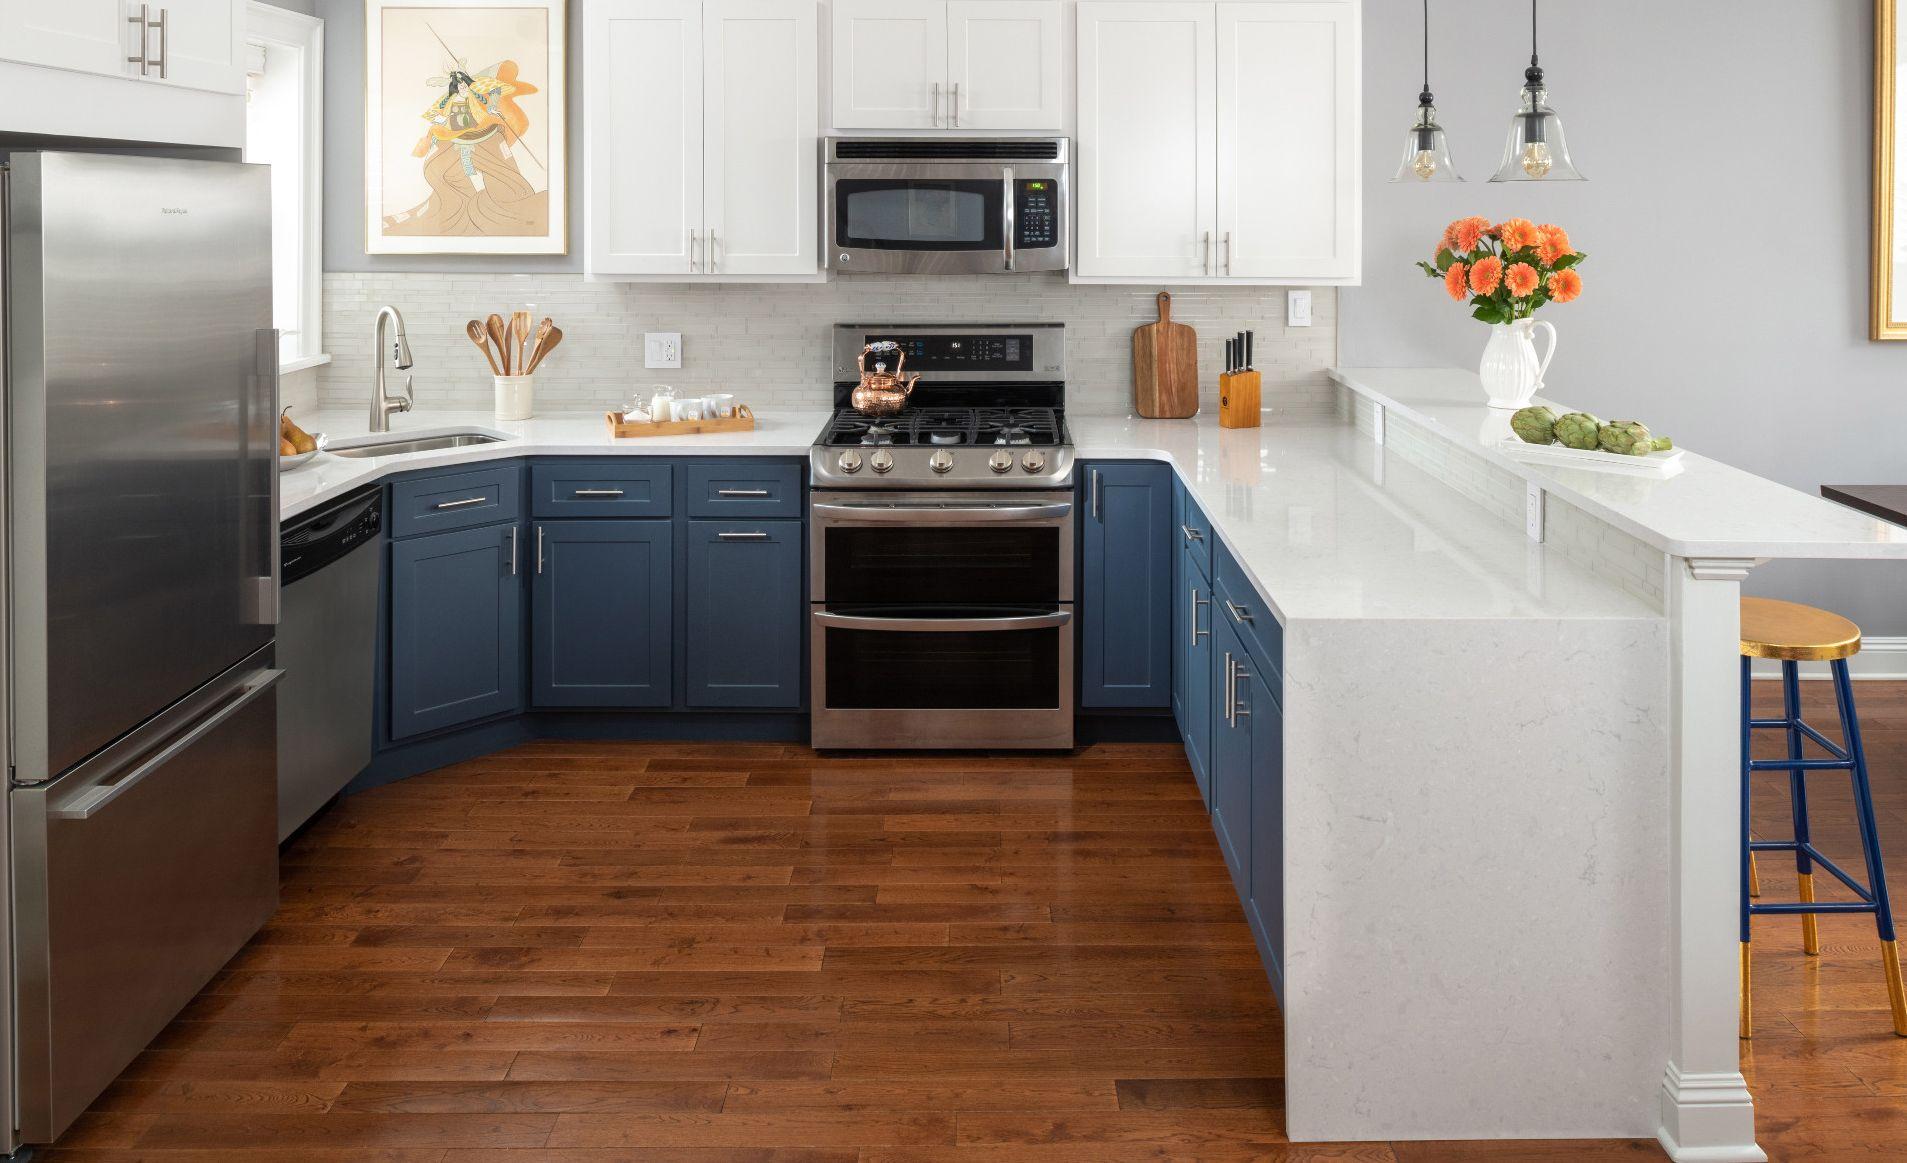 Two-tone kitchen remodel featuringCambria Weybournecountertops.